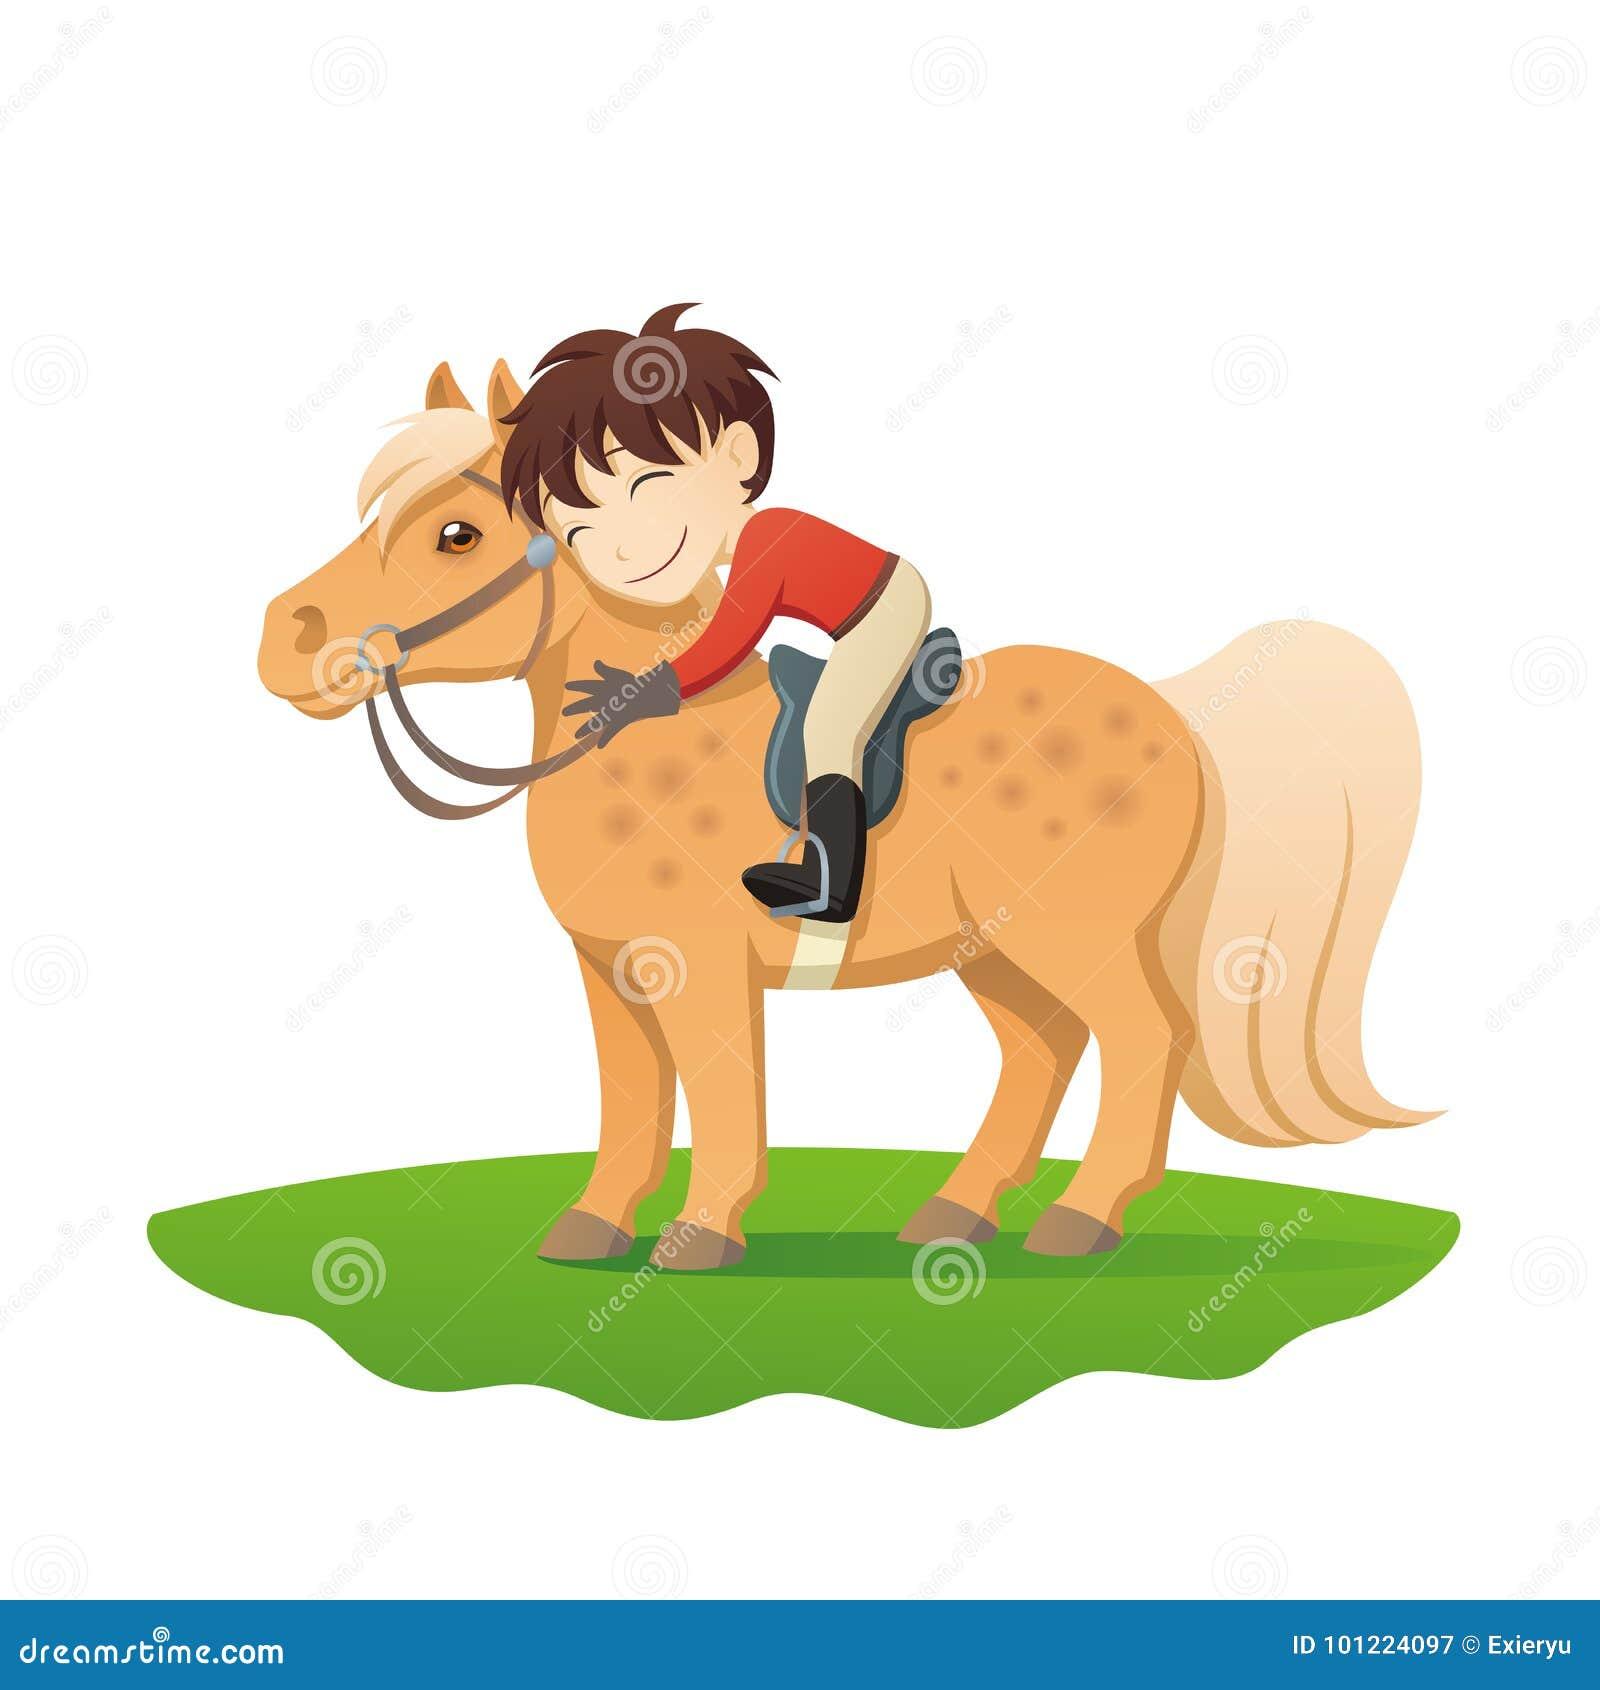 ponny dating